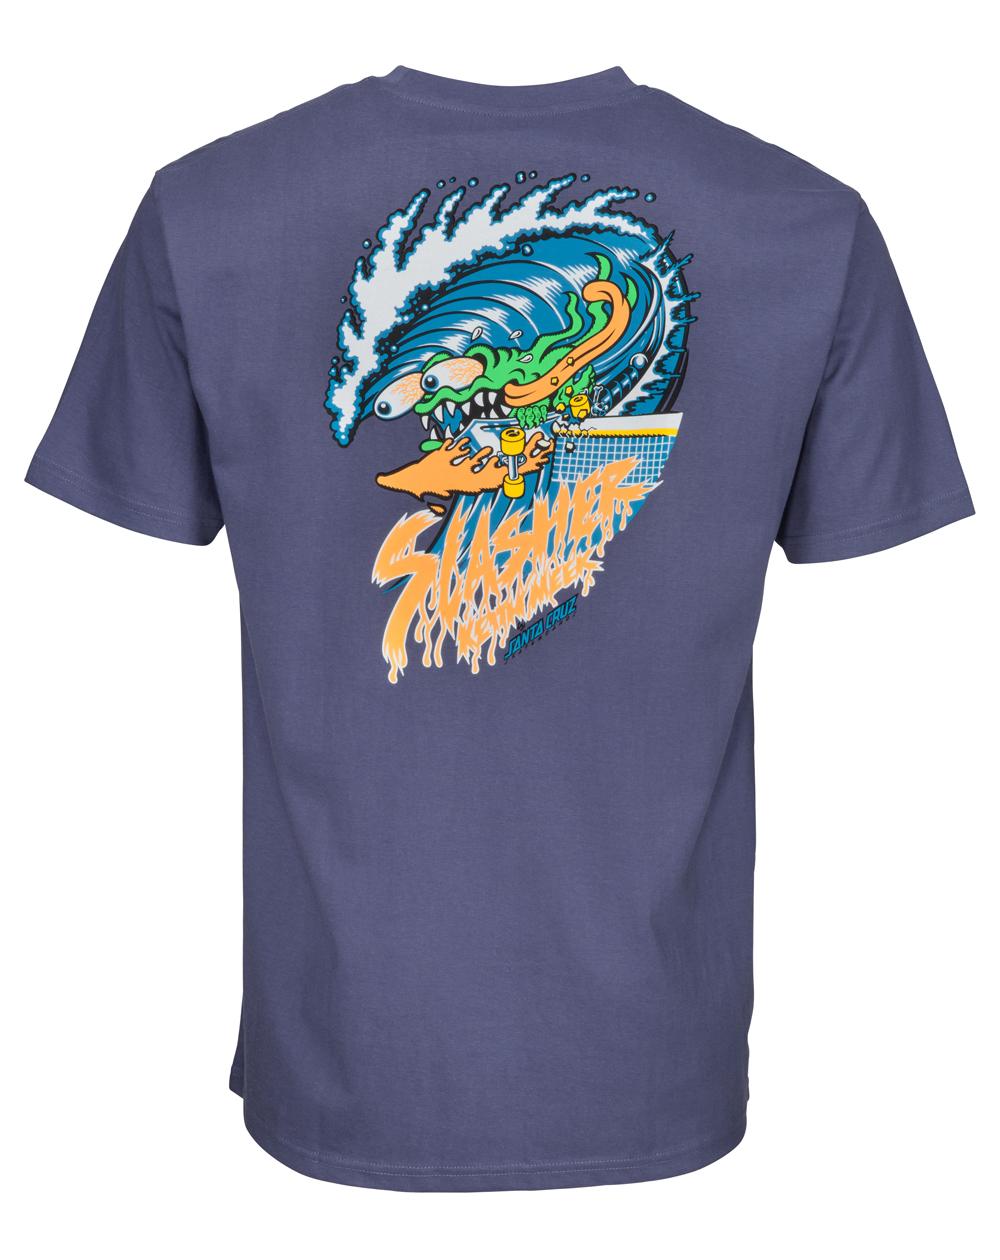 Santa Cruz Men's T-Shirt Wave Slasher Vintage Navy